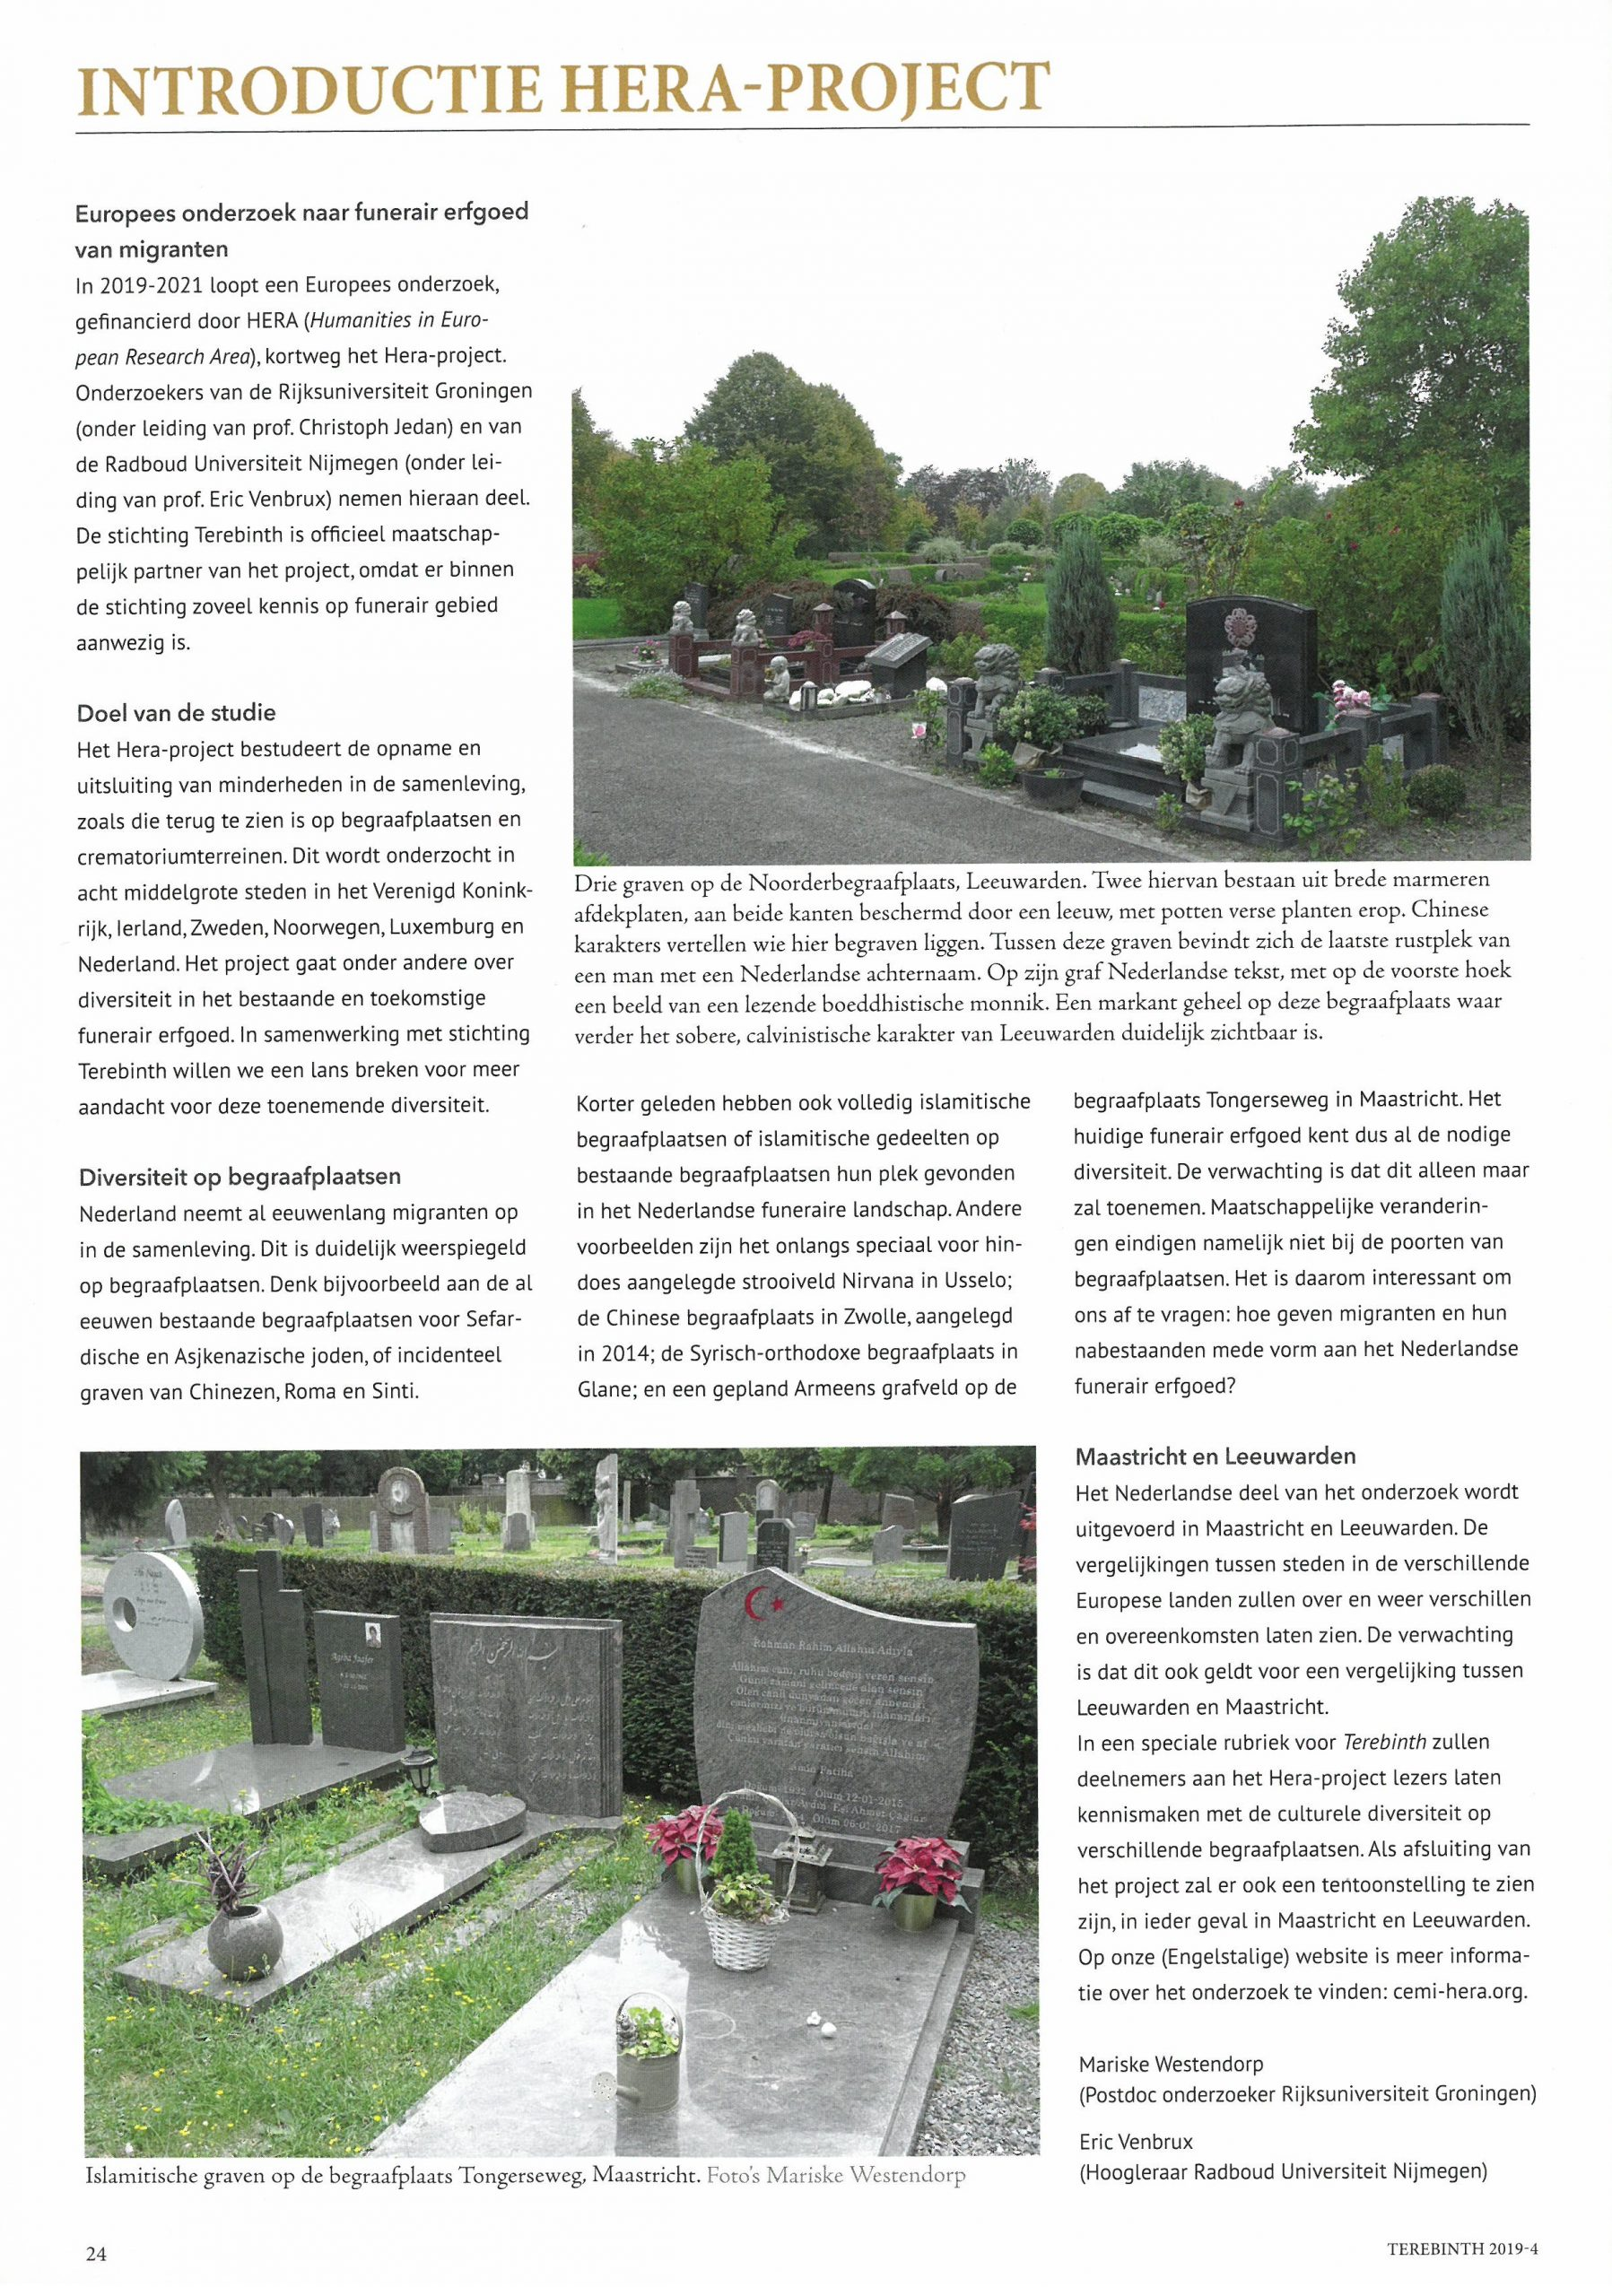 Terebinth december 2019 article HERA project